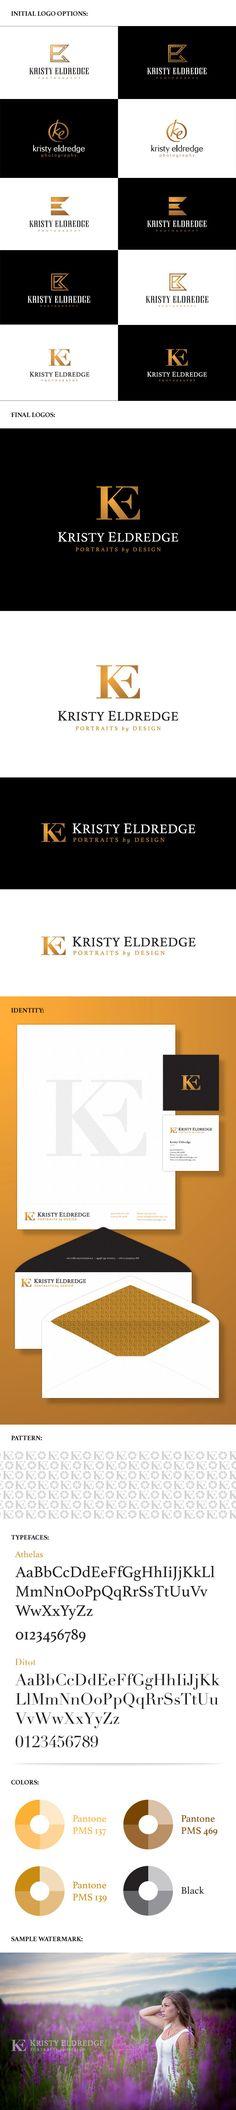 Kristy Eldredge Photography logo & branding package